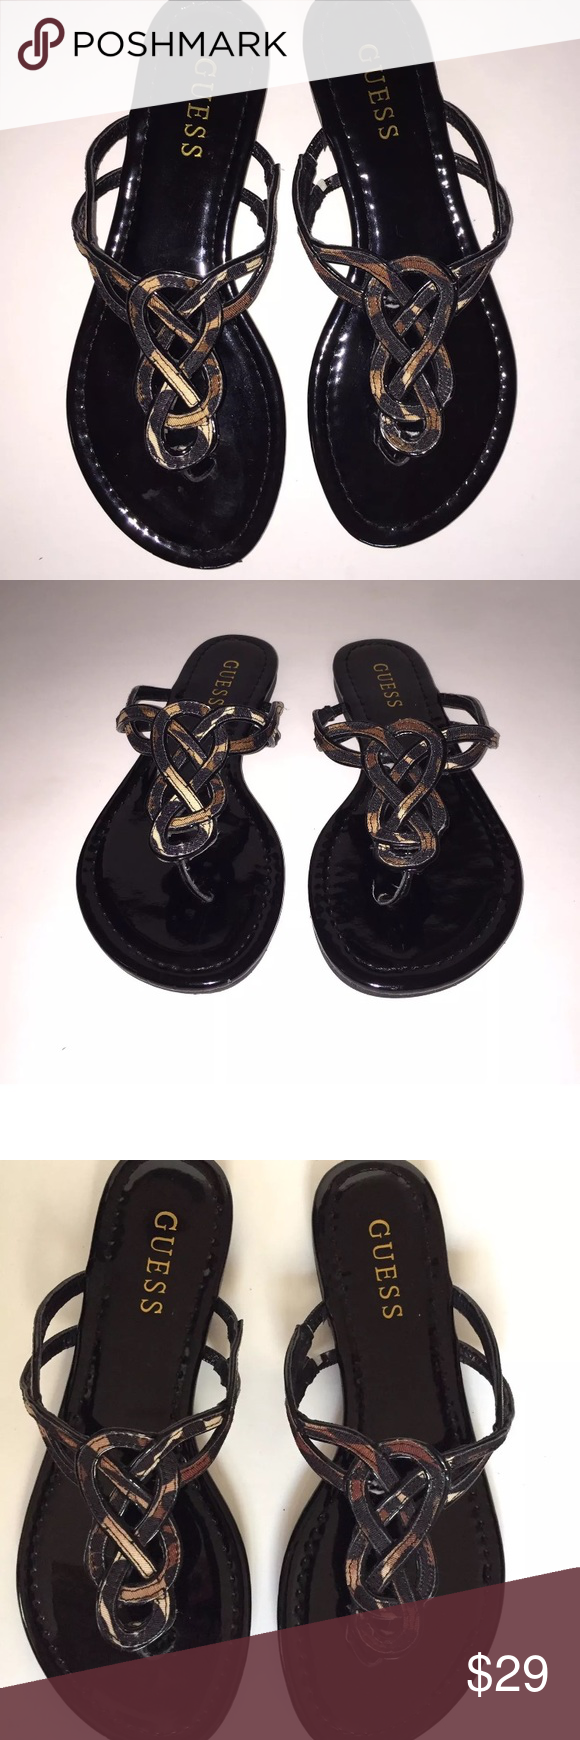 Guess Sandals Flip Flops Black Brown 7m